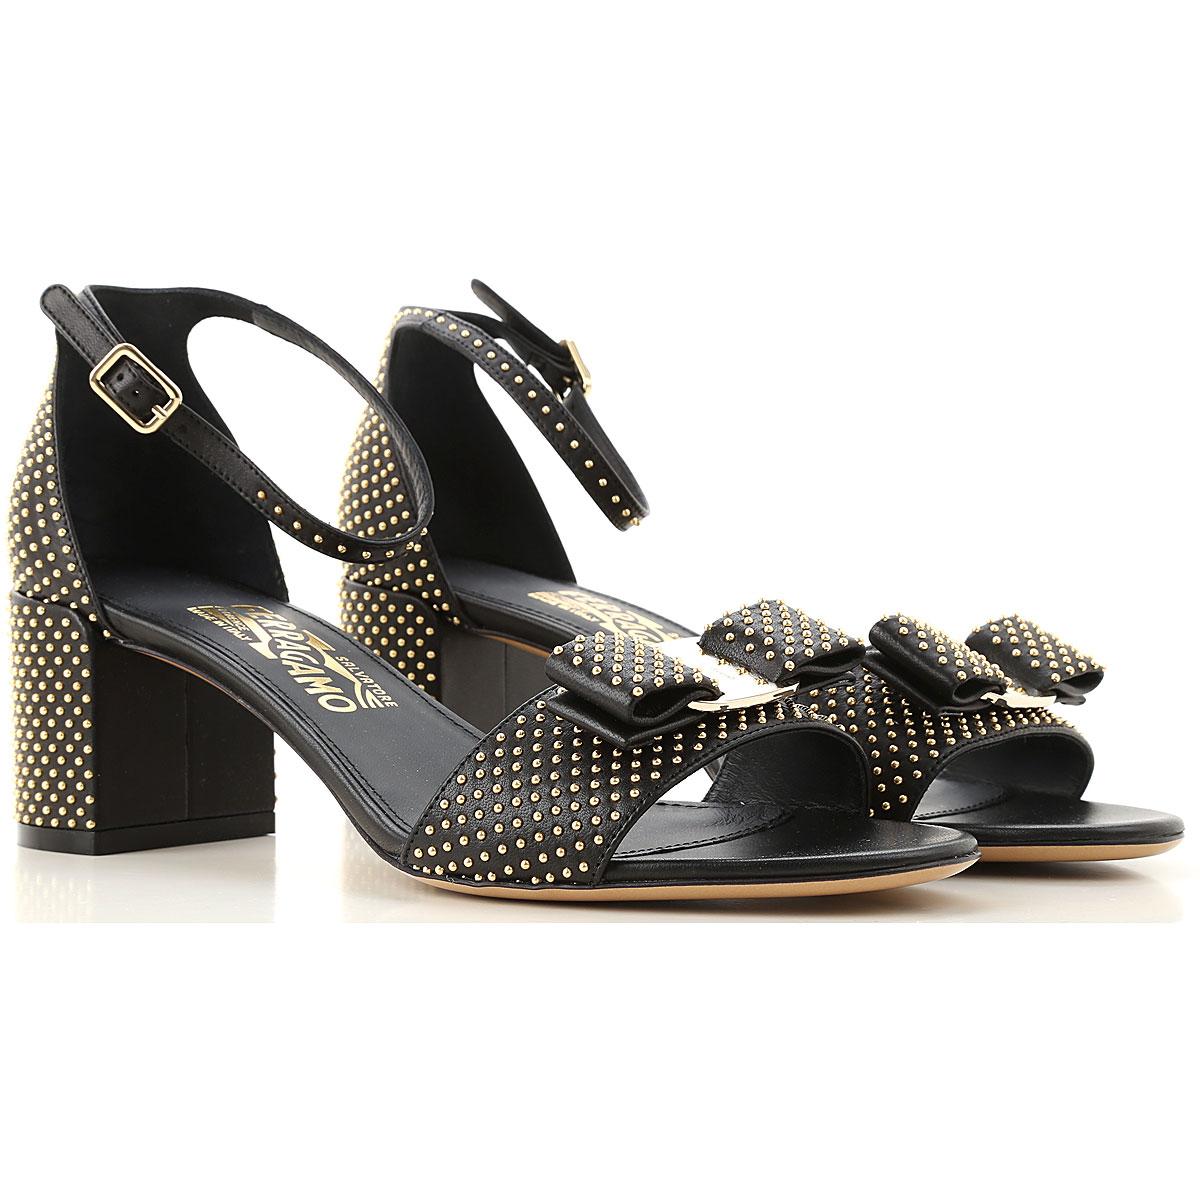 0d821701659 Zapatos > Ferragamo > Mujer > Zapatos Ferragamo: Sandalias > Botas ...